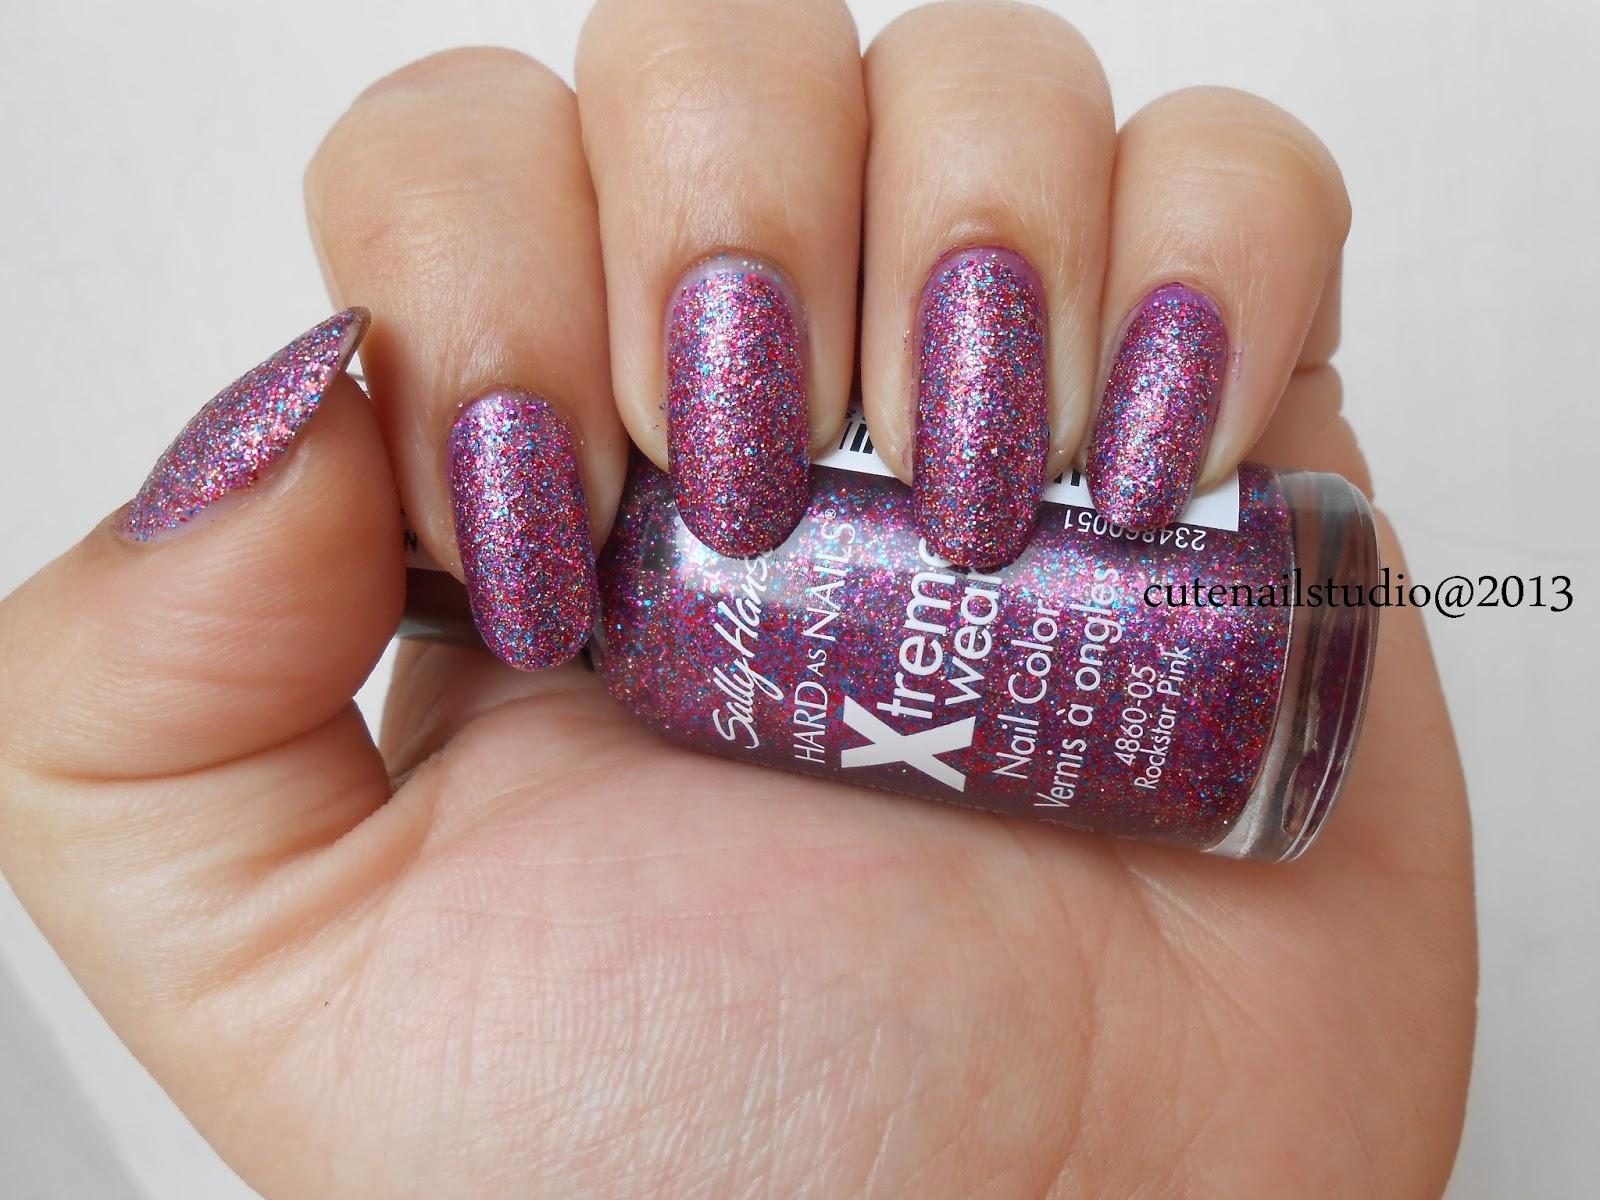 Cute nails: Sally Hansen xtreme wear nail color Rockstar Pink and In ...